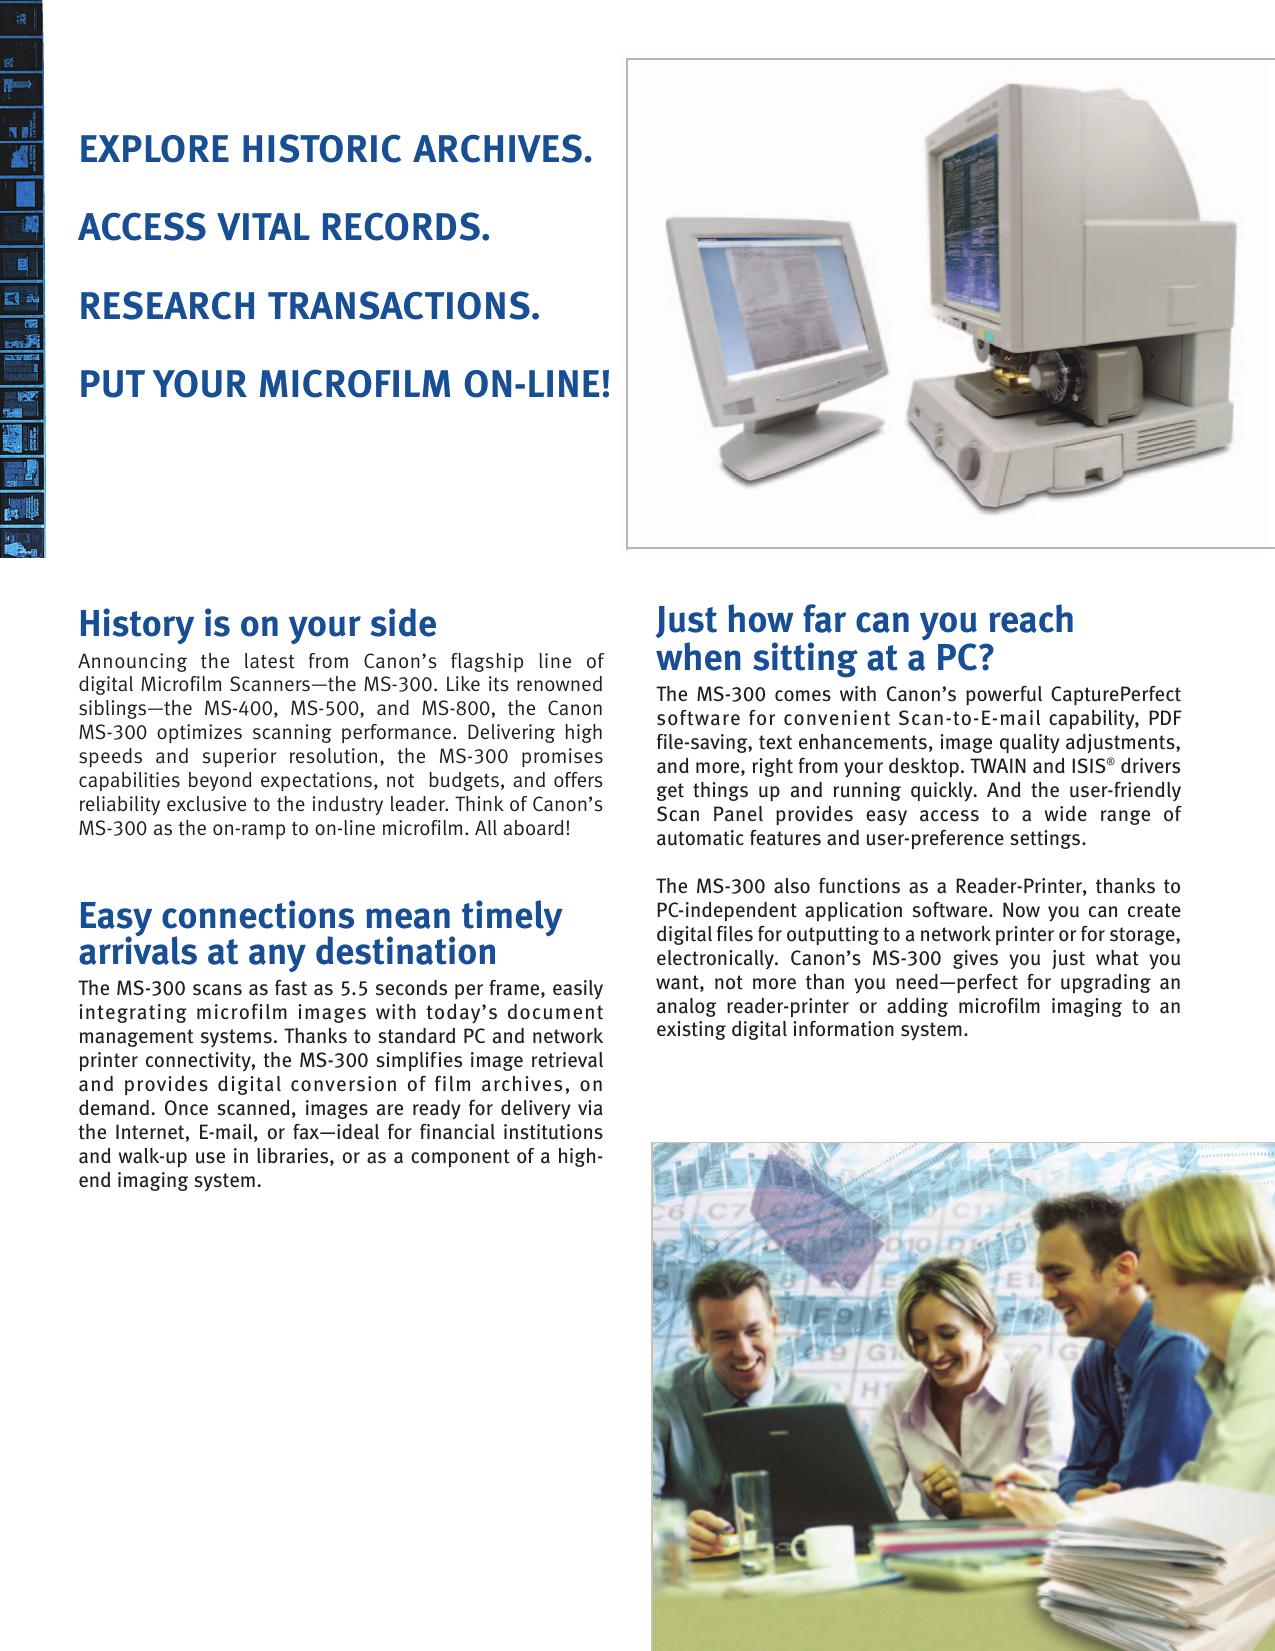 Microfilm